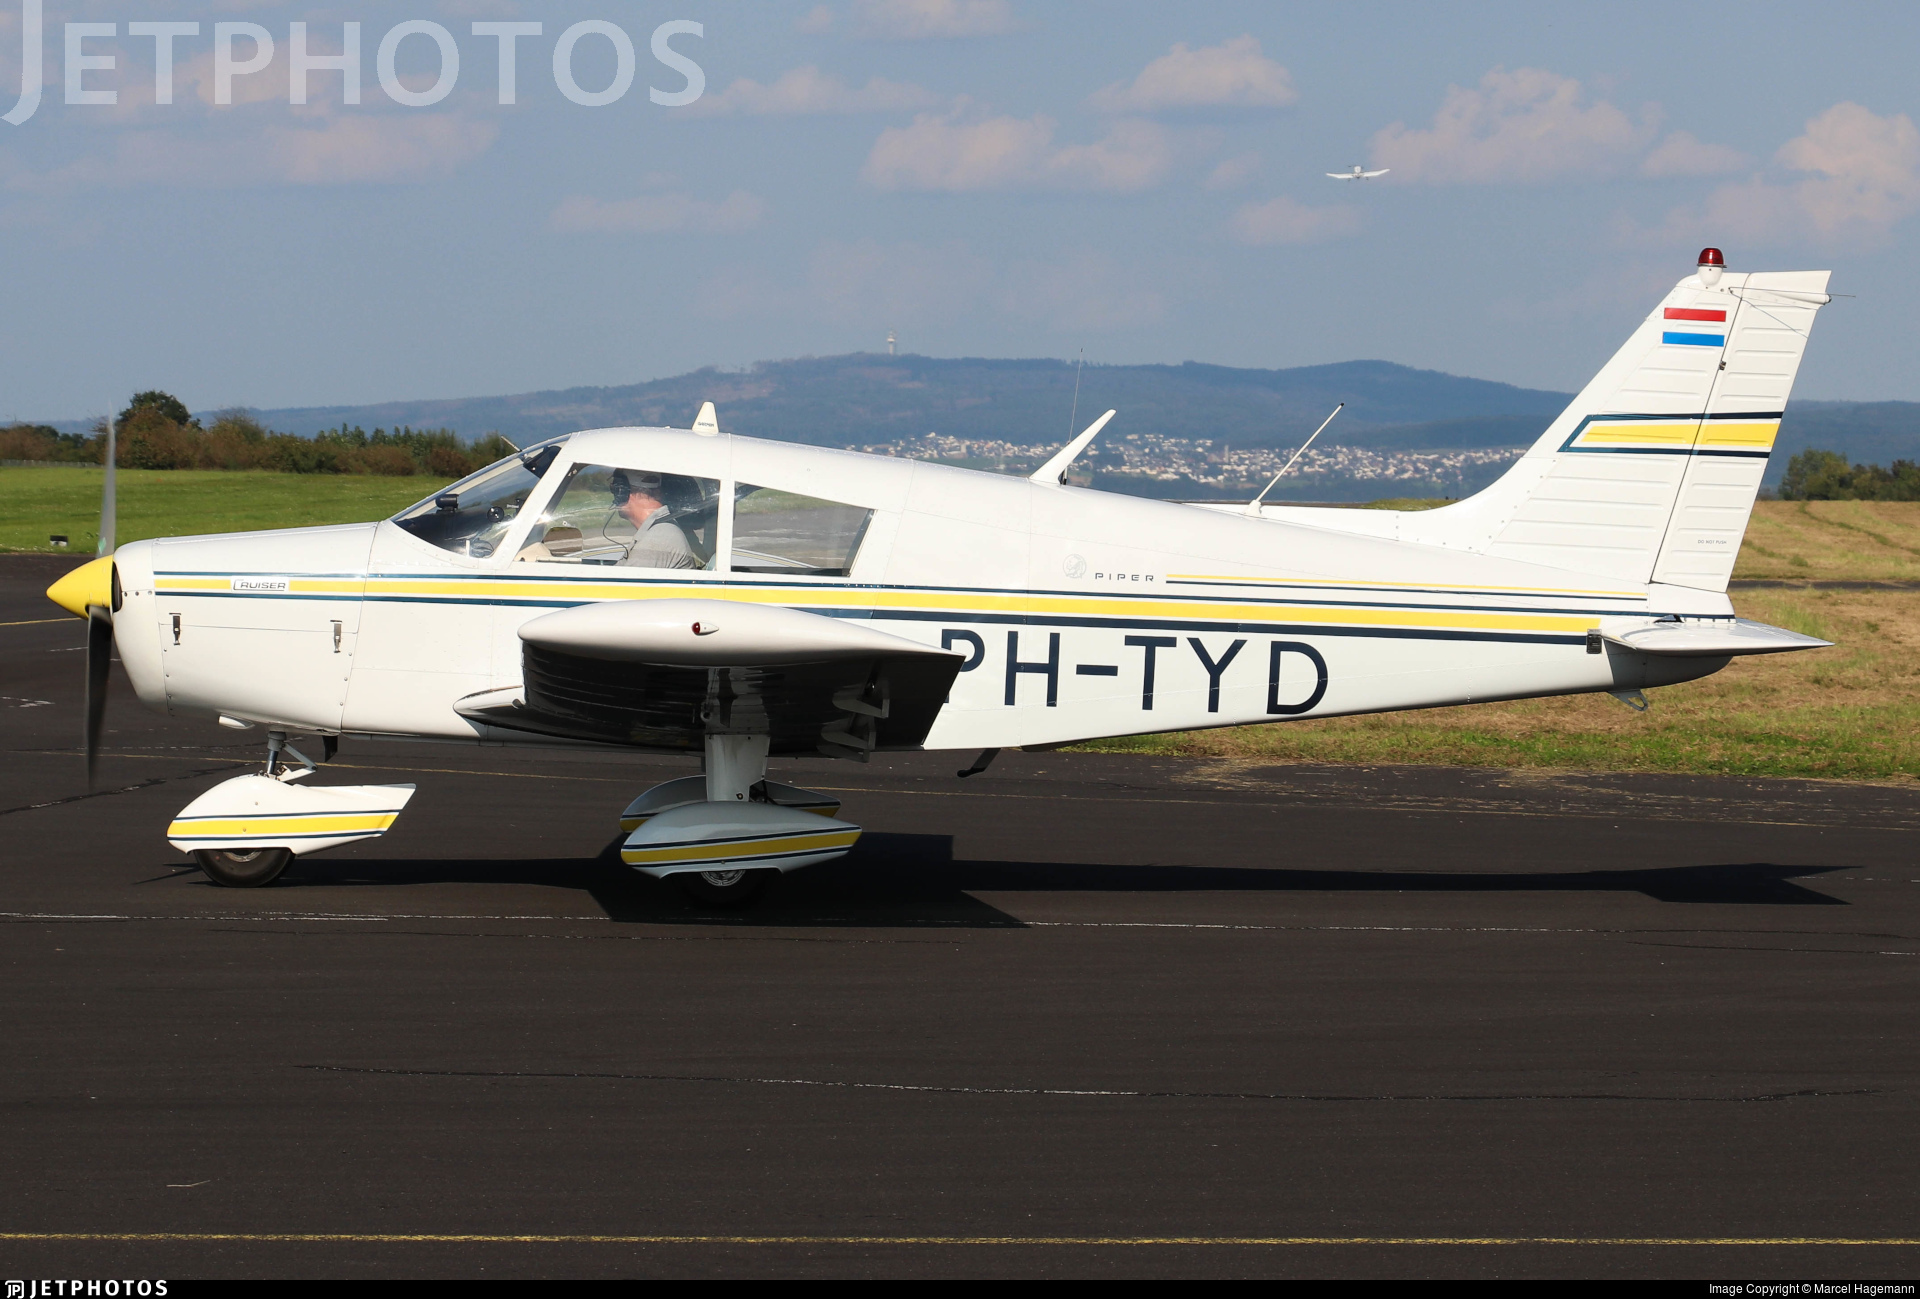 PH-TYD - Piper PA-28-140 Cherokee F - Private